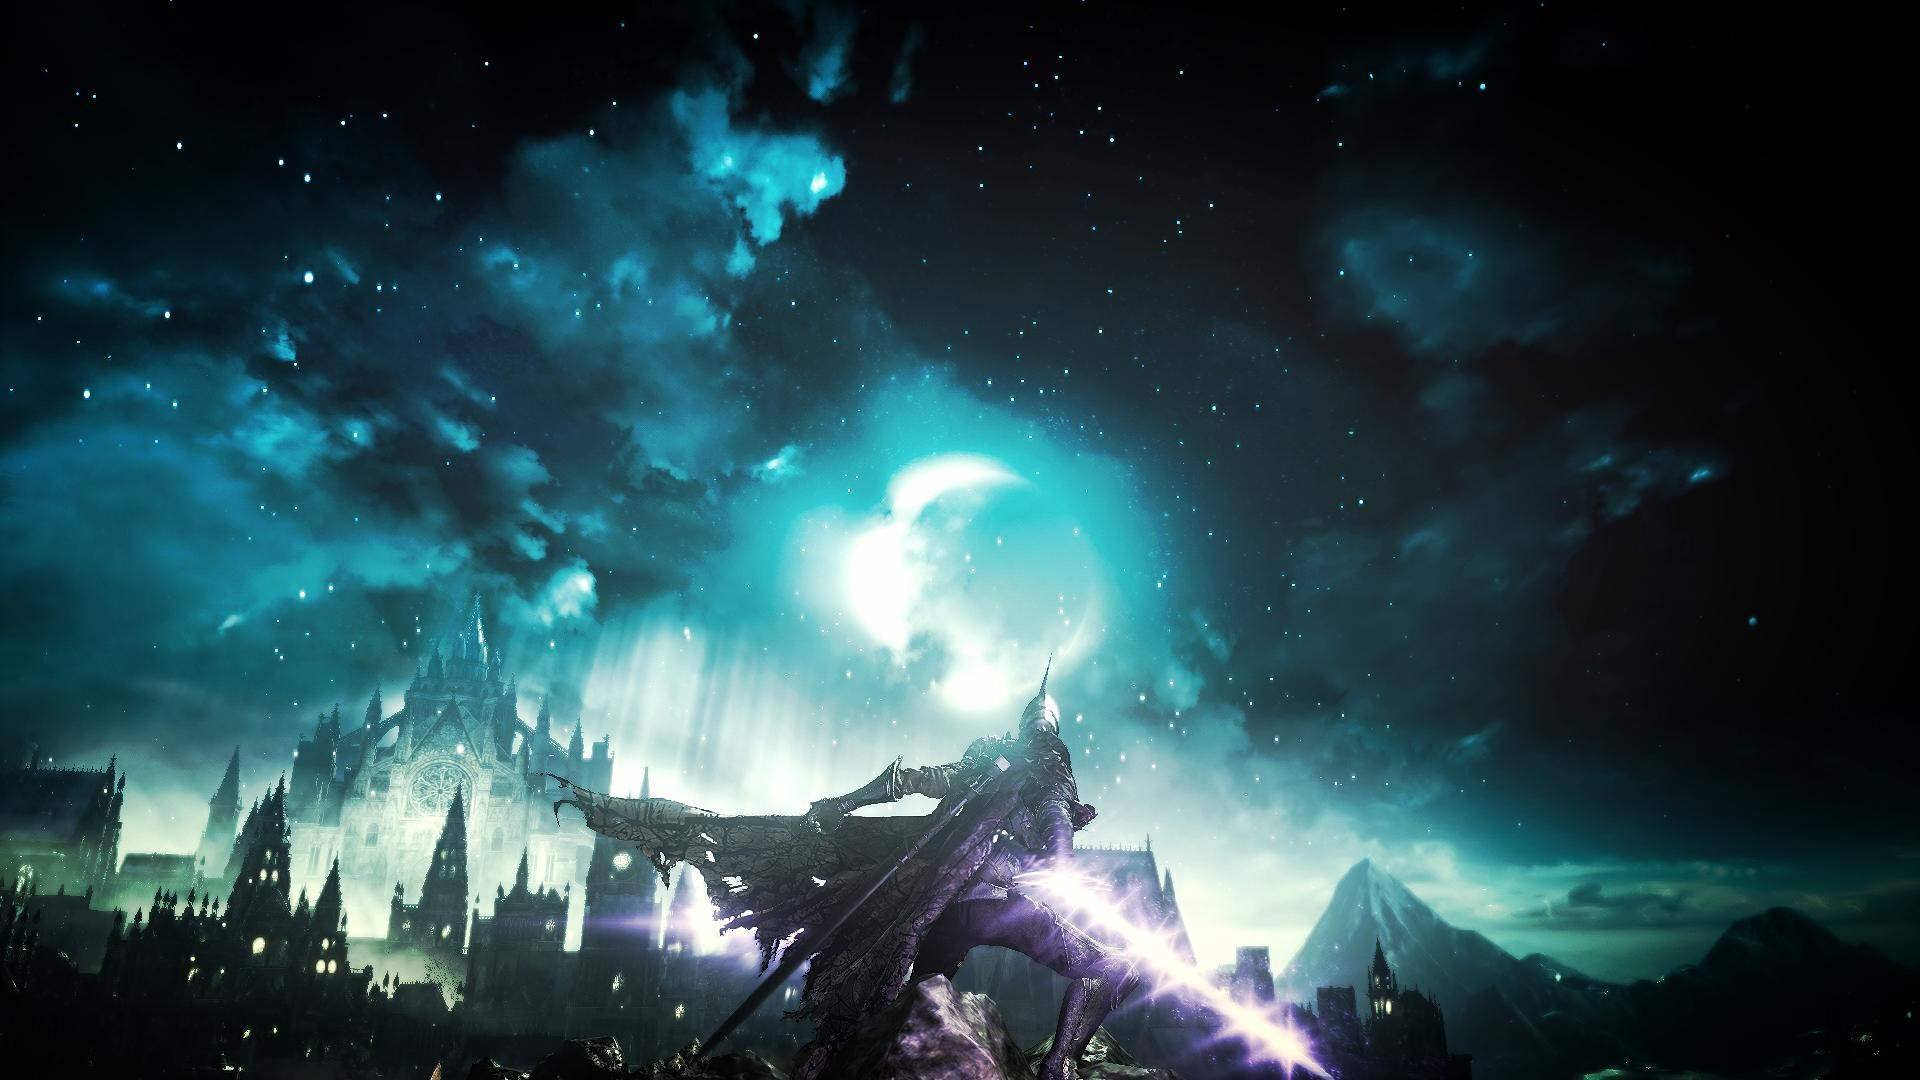 Dark Souls 3 Wallpaper 1920x1080 (77+ Images